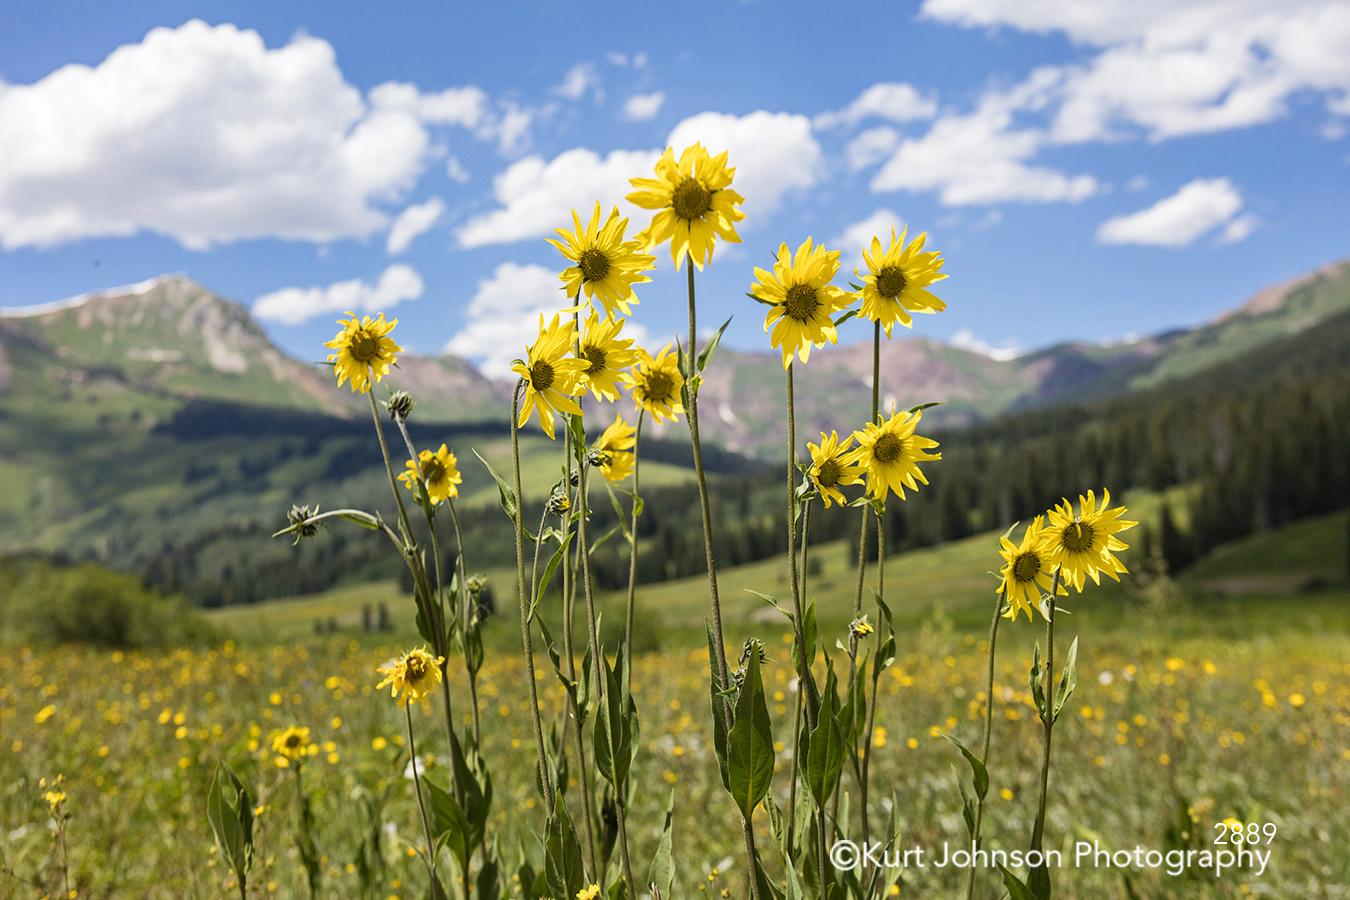 bright yellow flower midwest field wildflower sunflower meadow blue sky clouds